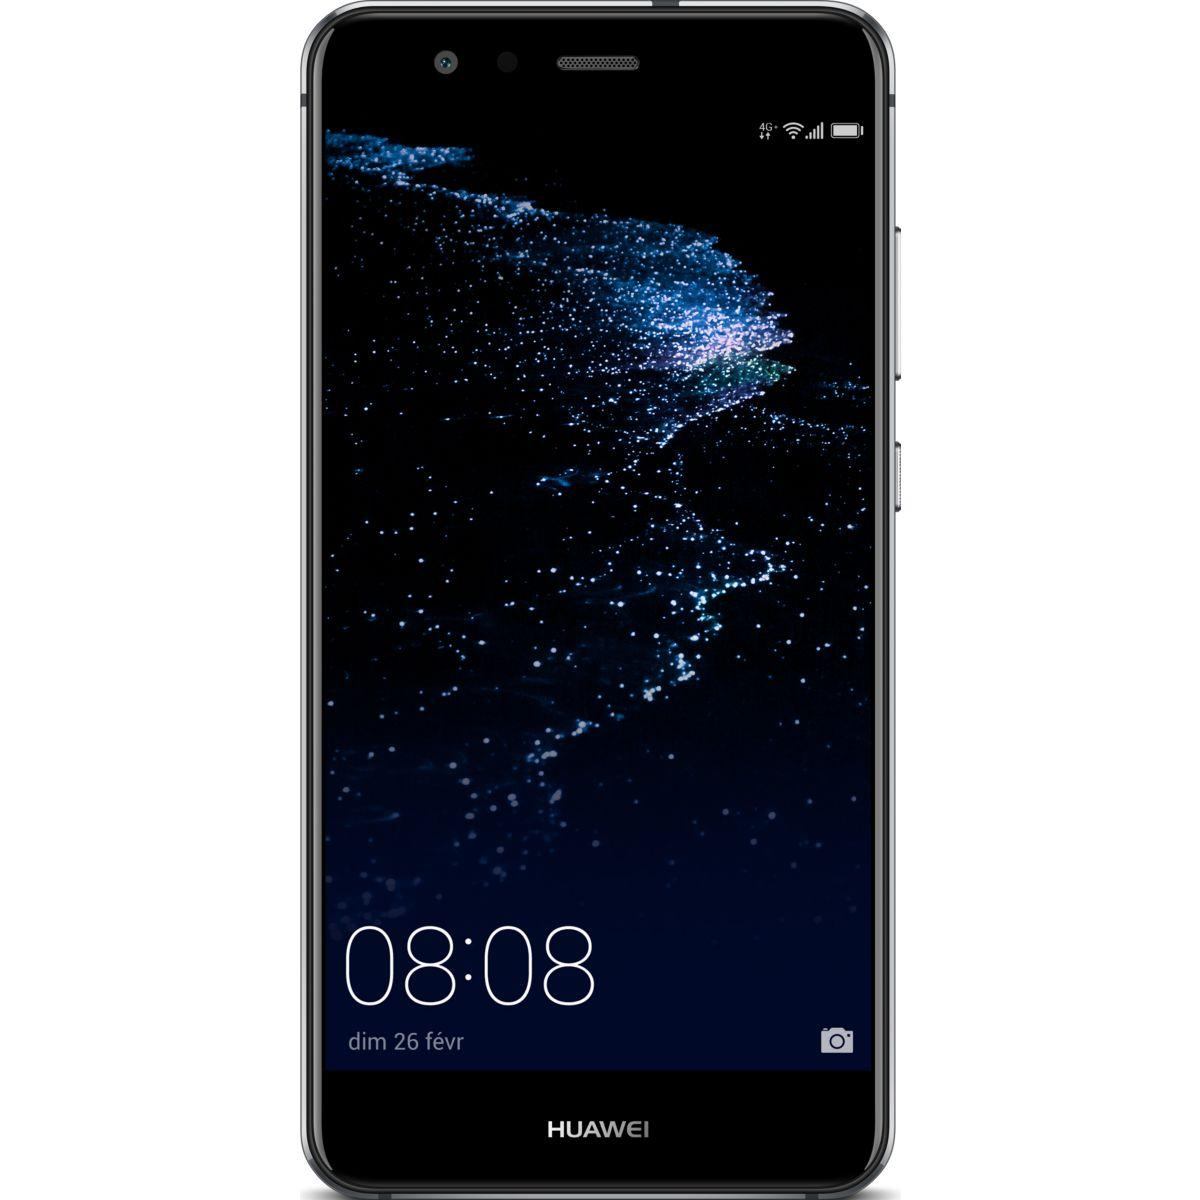 Smartphone huawei p10 lite noir - 2% de remise imm?diate avec le code : noel2